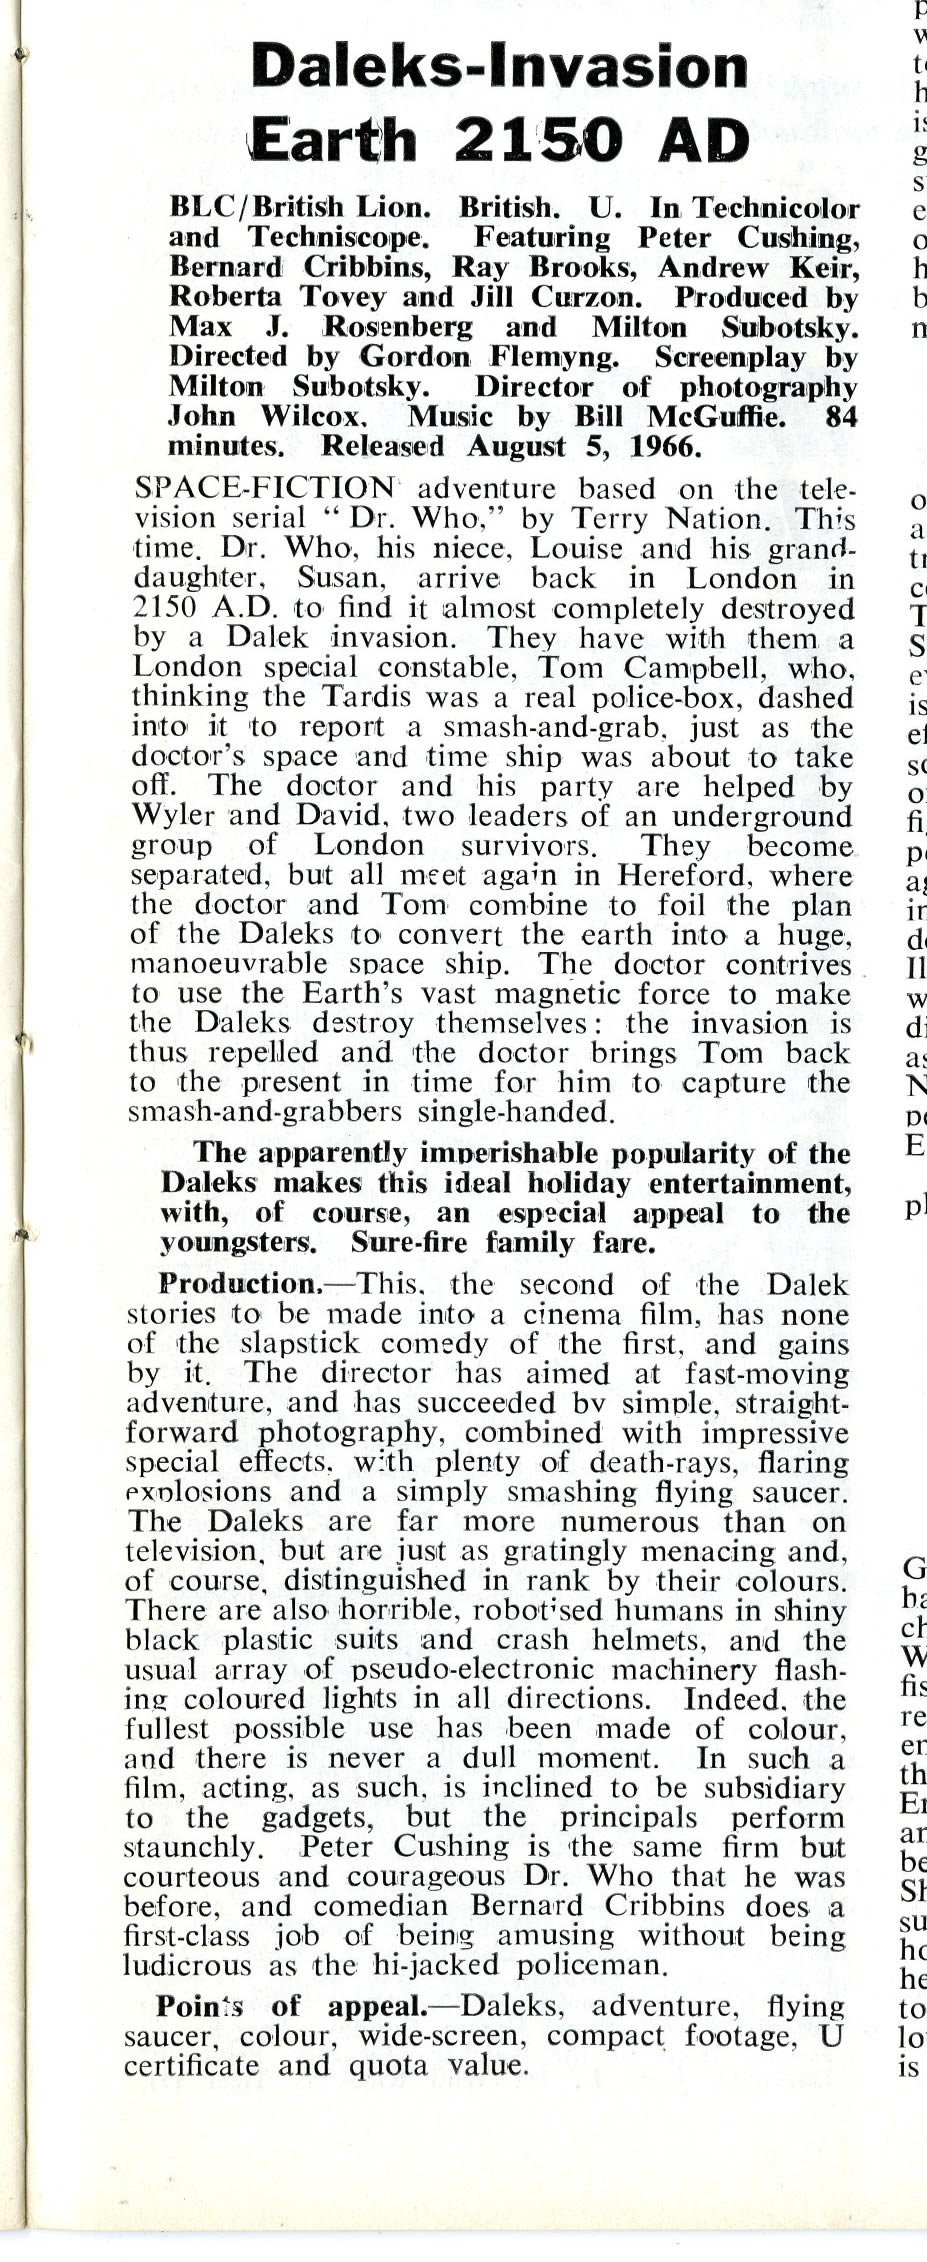 Kine Weekly, 14 July 1966